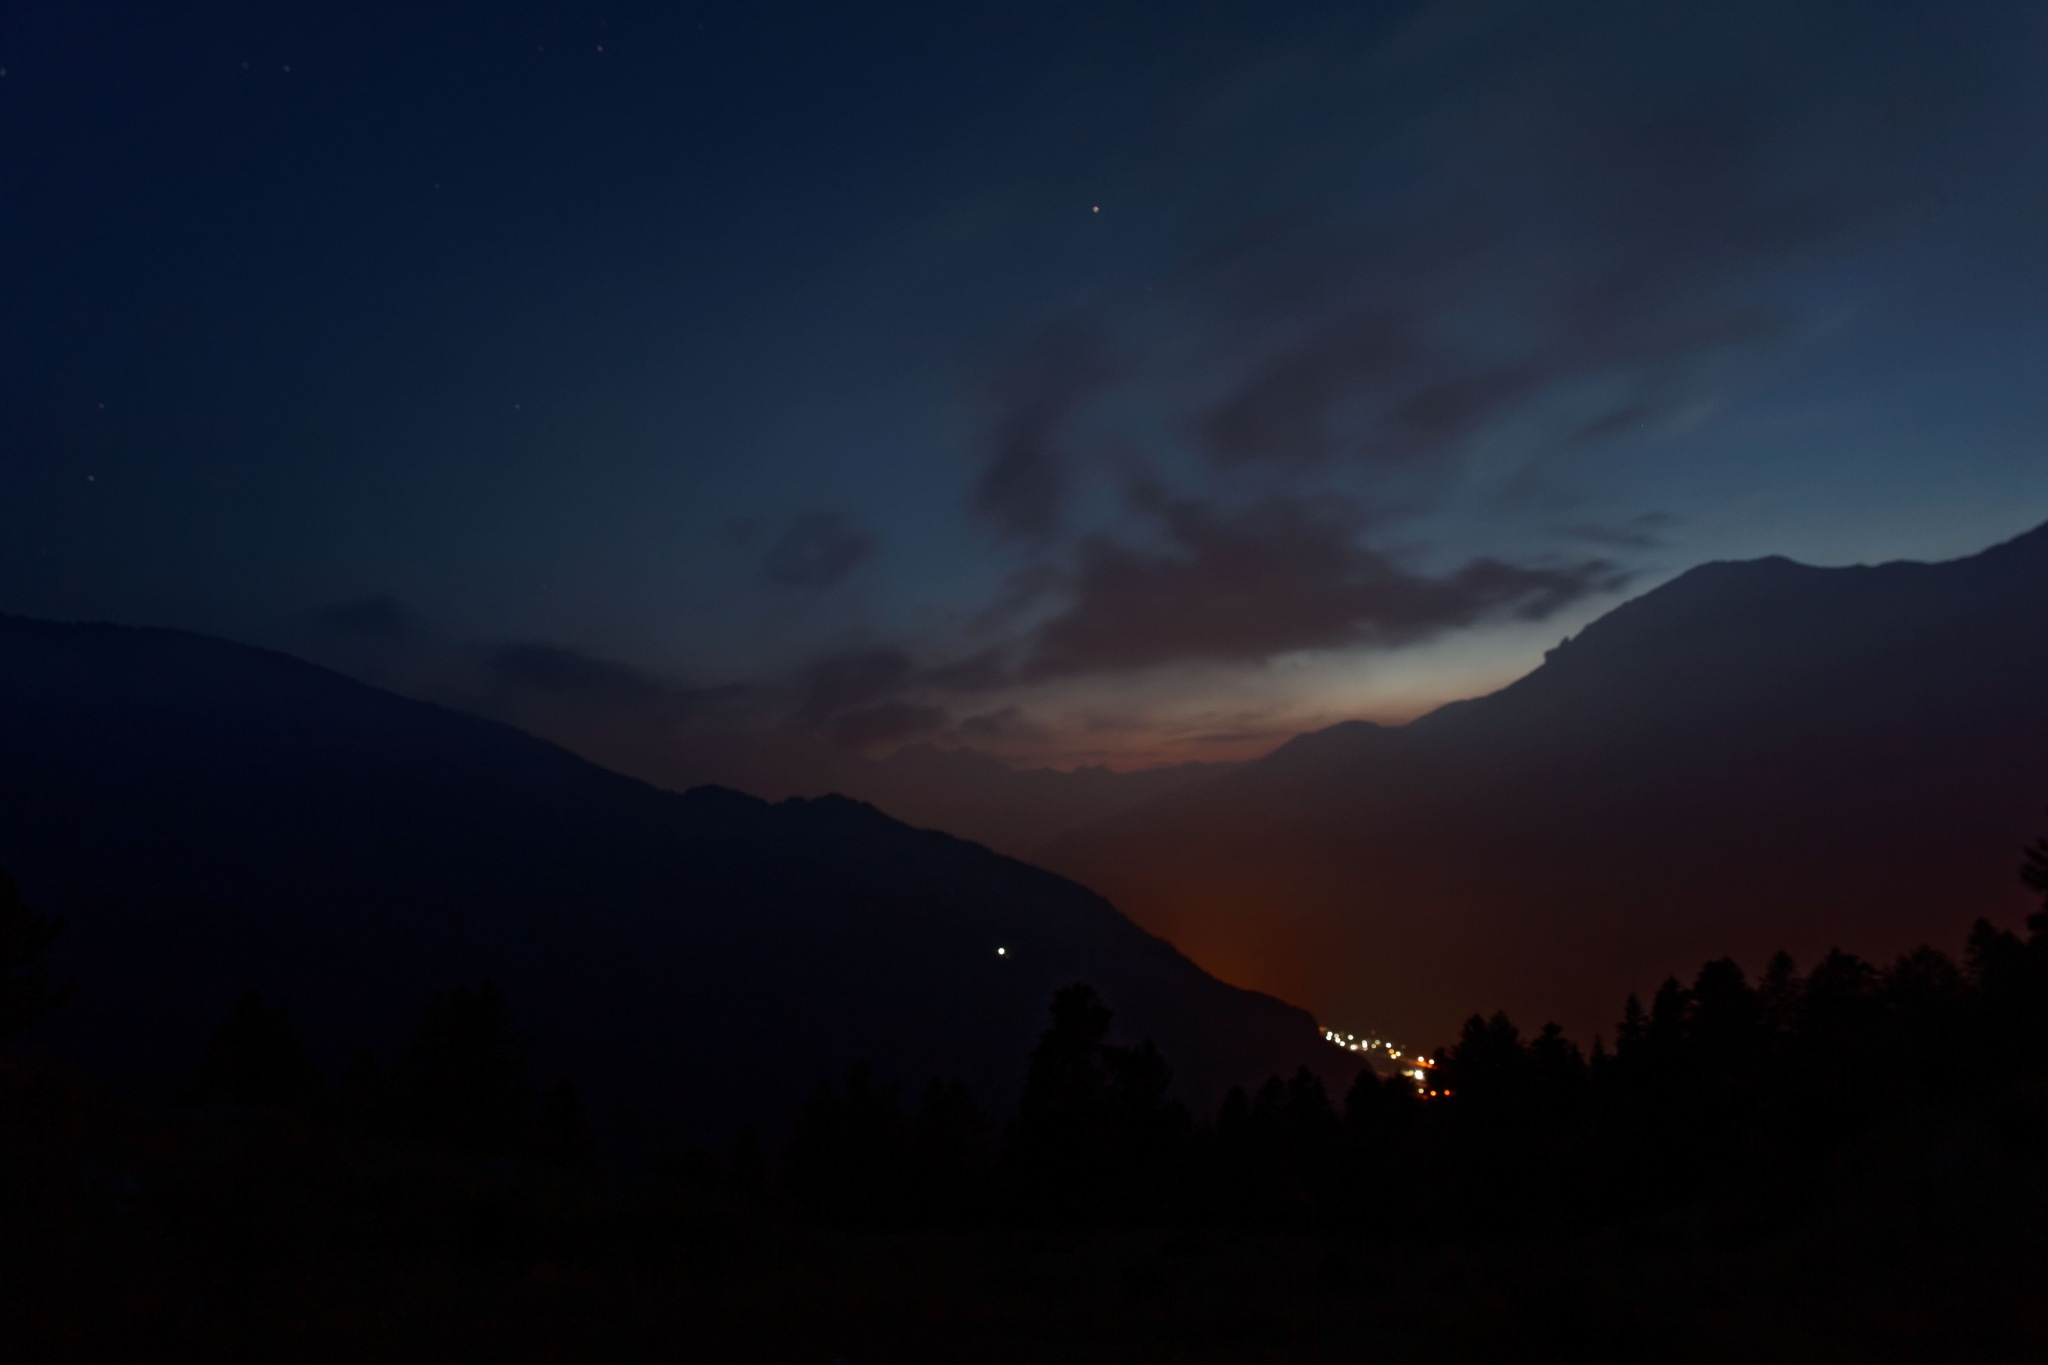 By night by Andrea Zork Abbà